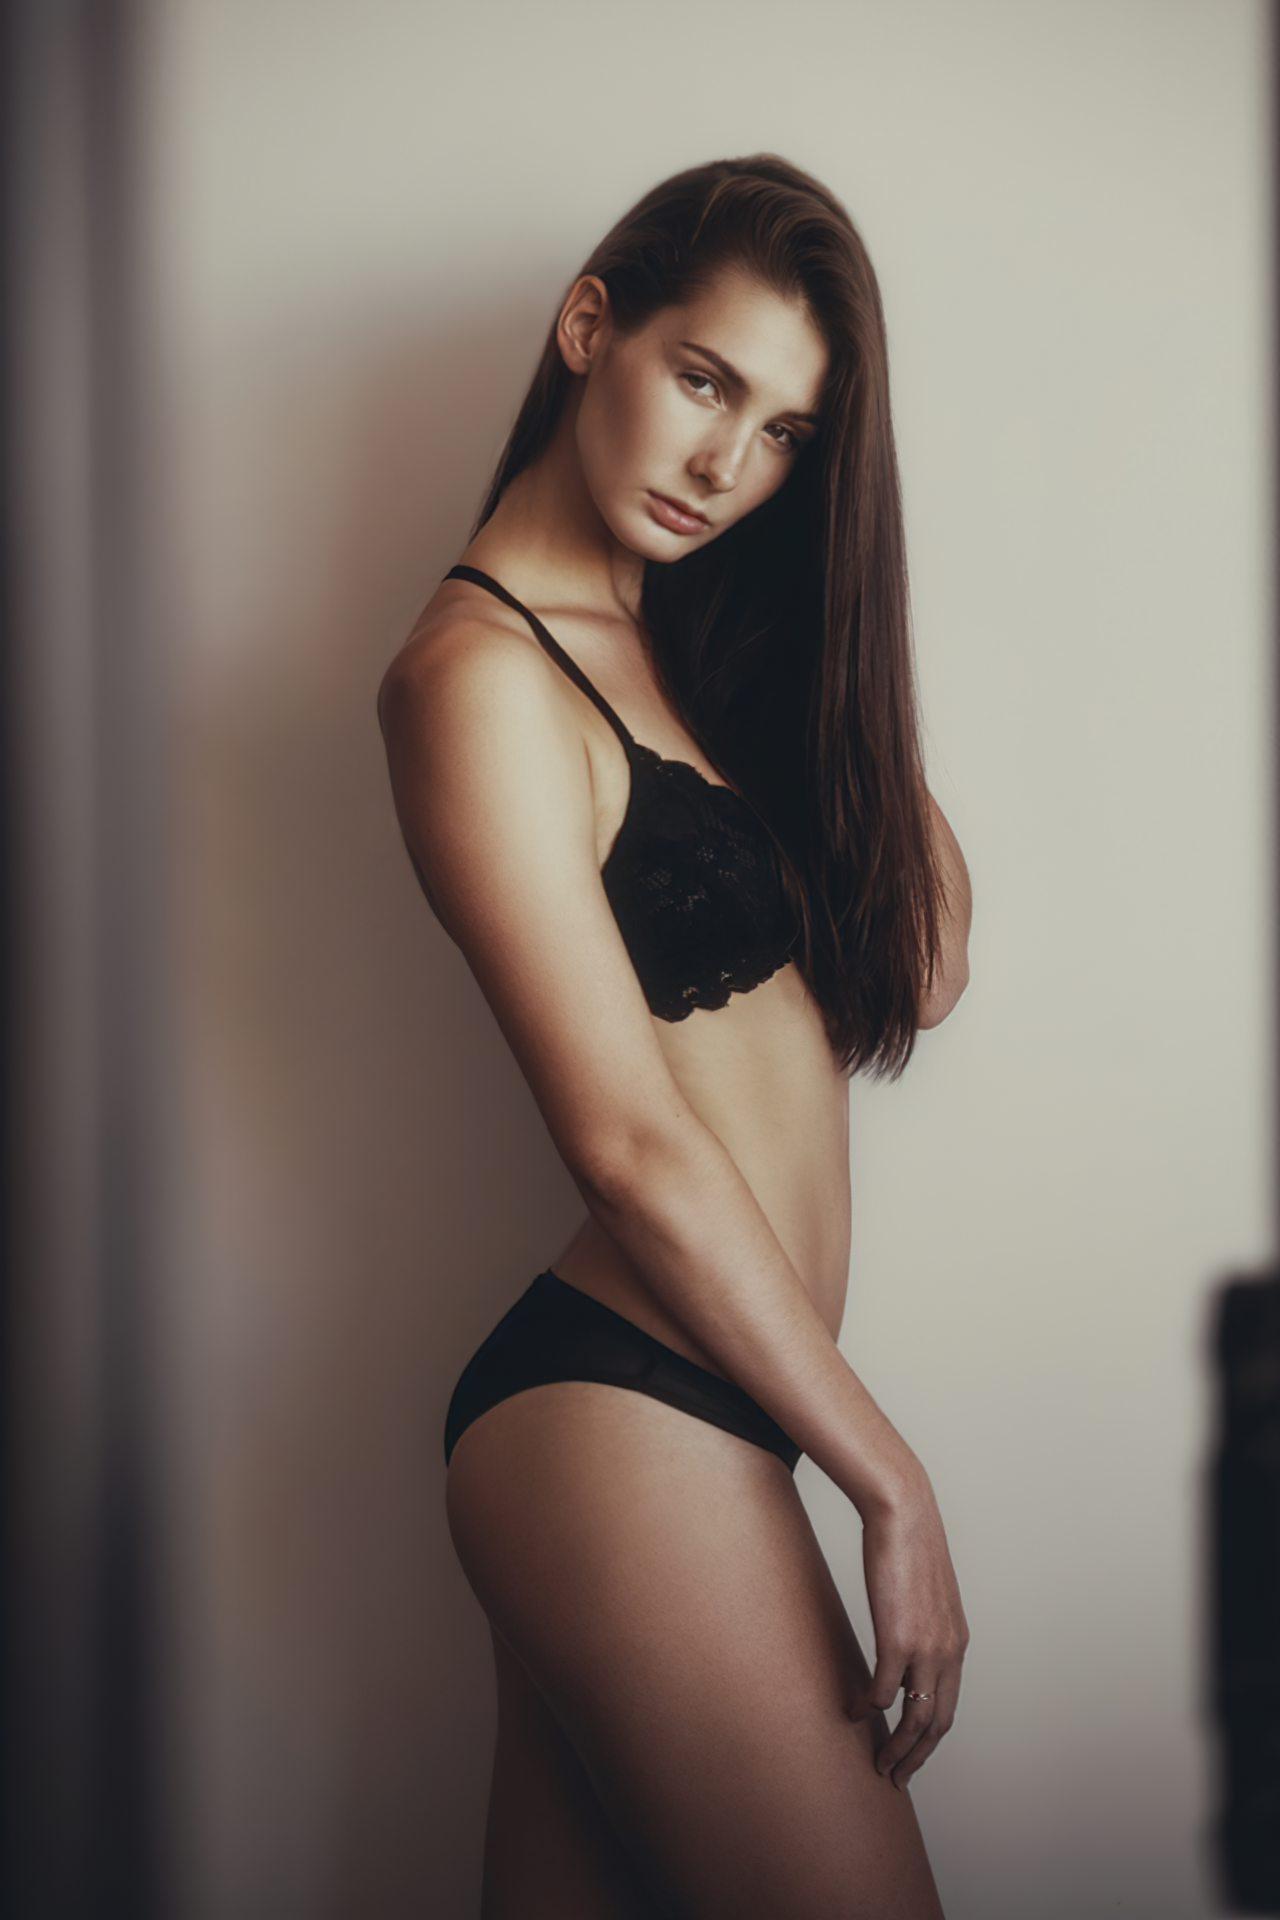 50 Fotos de Mulheres (18)